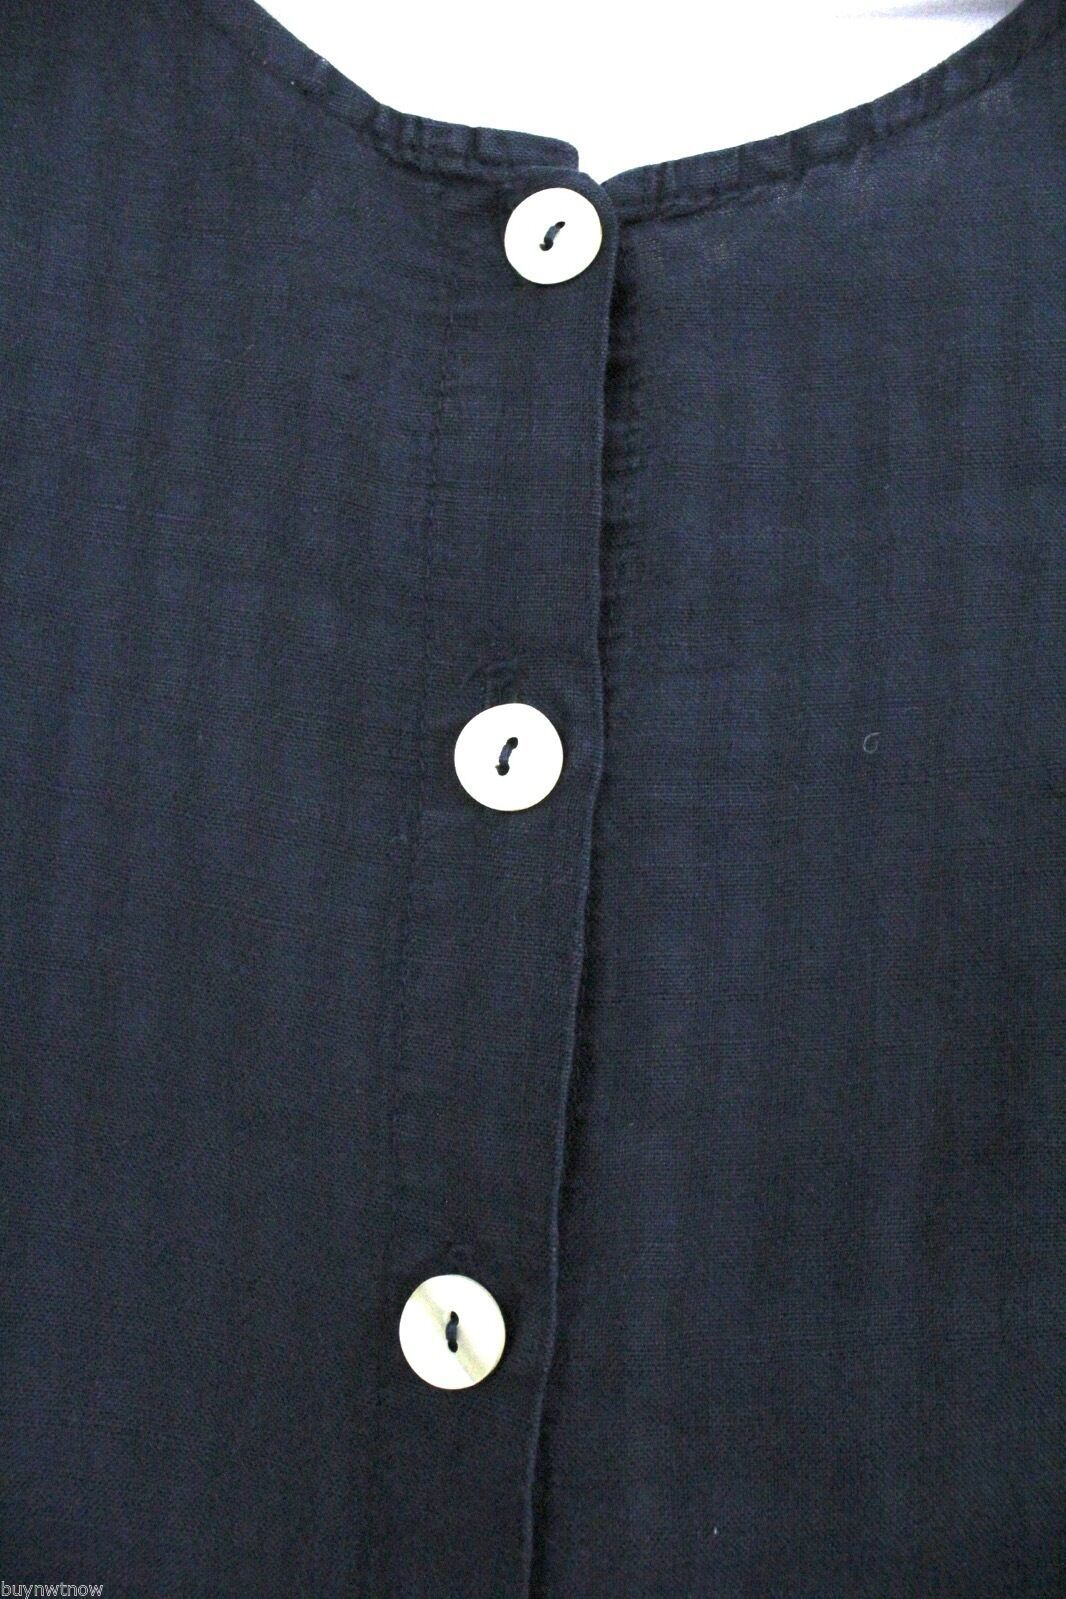 Fresh Produce Tank Maxi Dress & Jacket Blouse Top Black Windowpane Print  M image 5